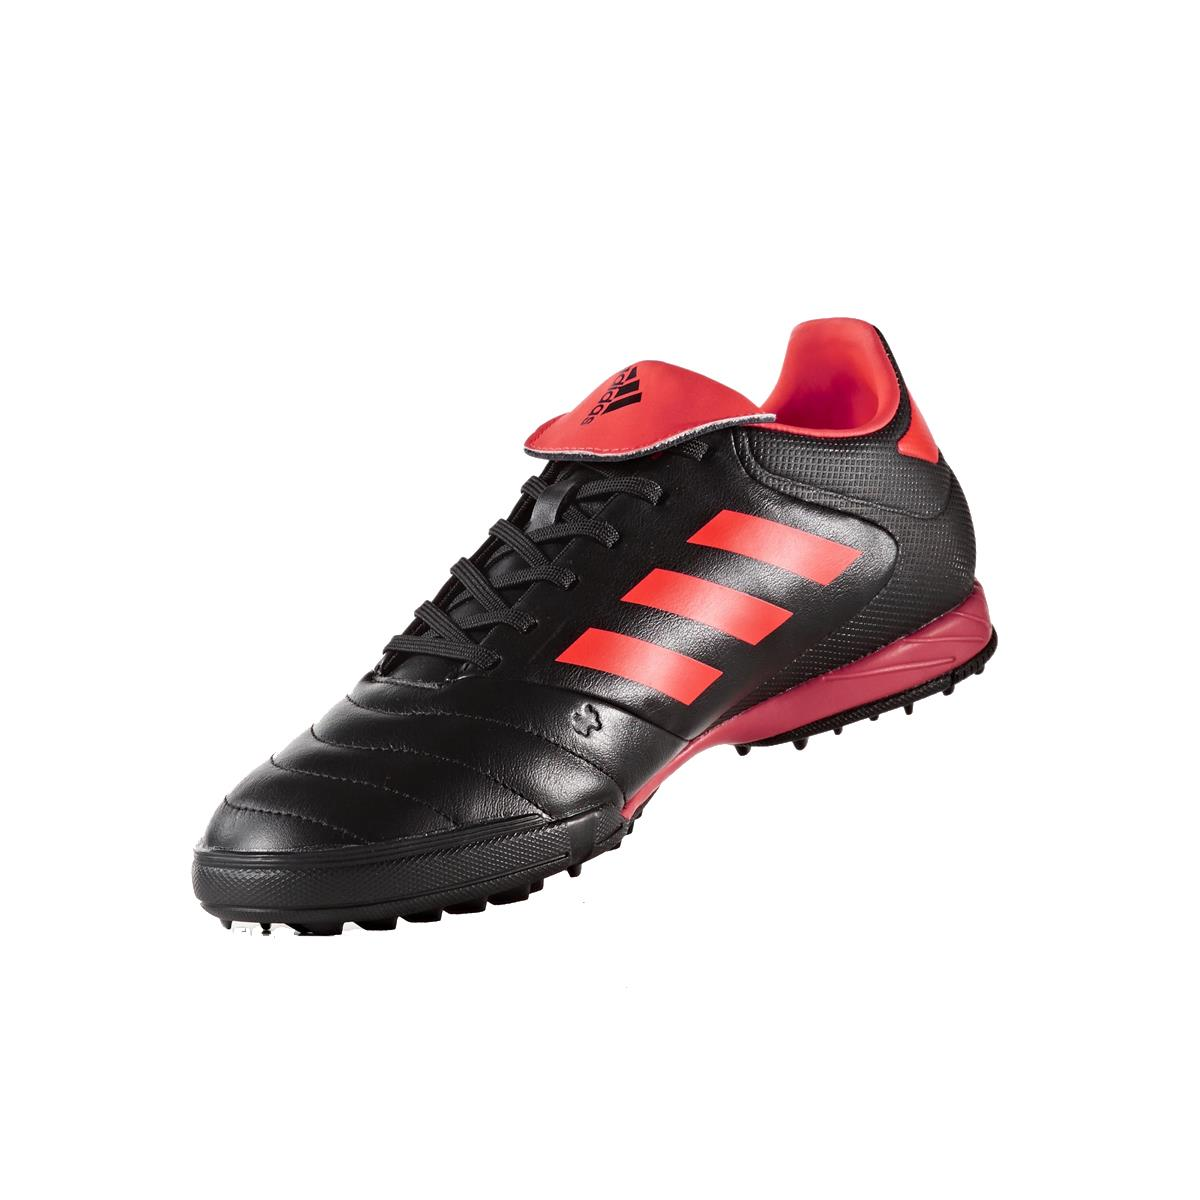 785a473fa Chuteira Society Adidas Copa 17.3